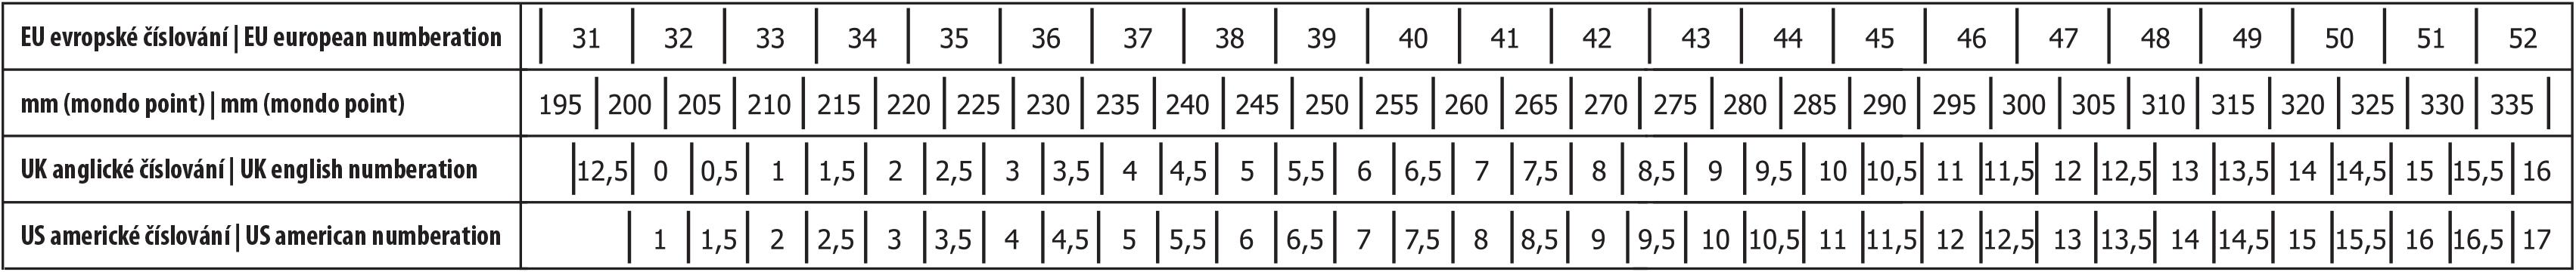 tablka_velikosti